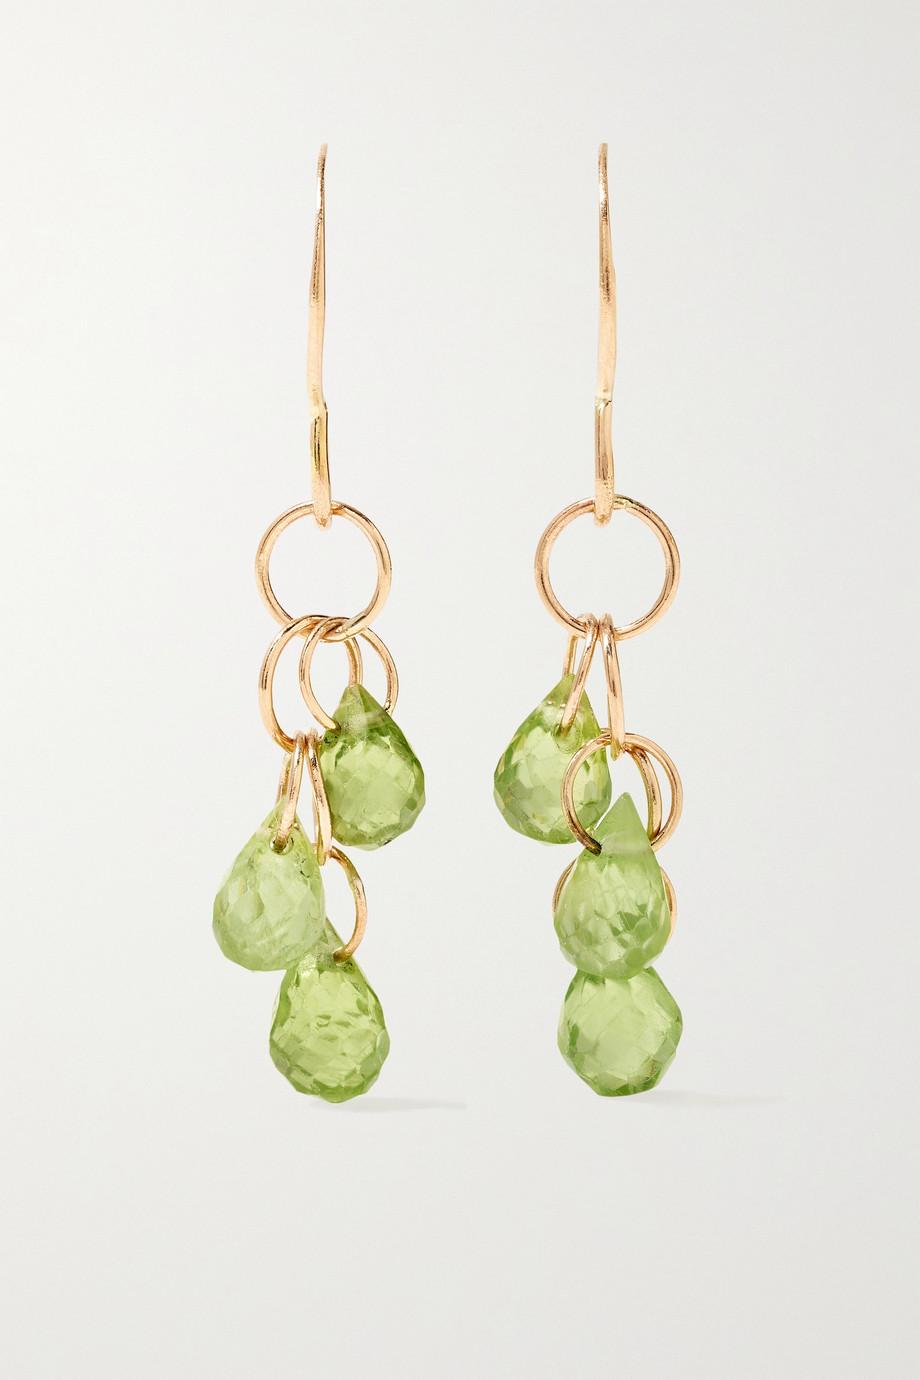 Melissa Joy Manning 14-karat recycled gold peridot earrings